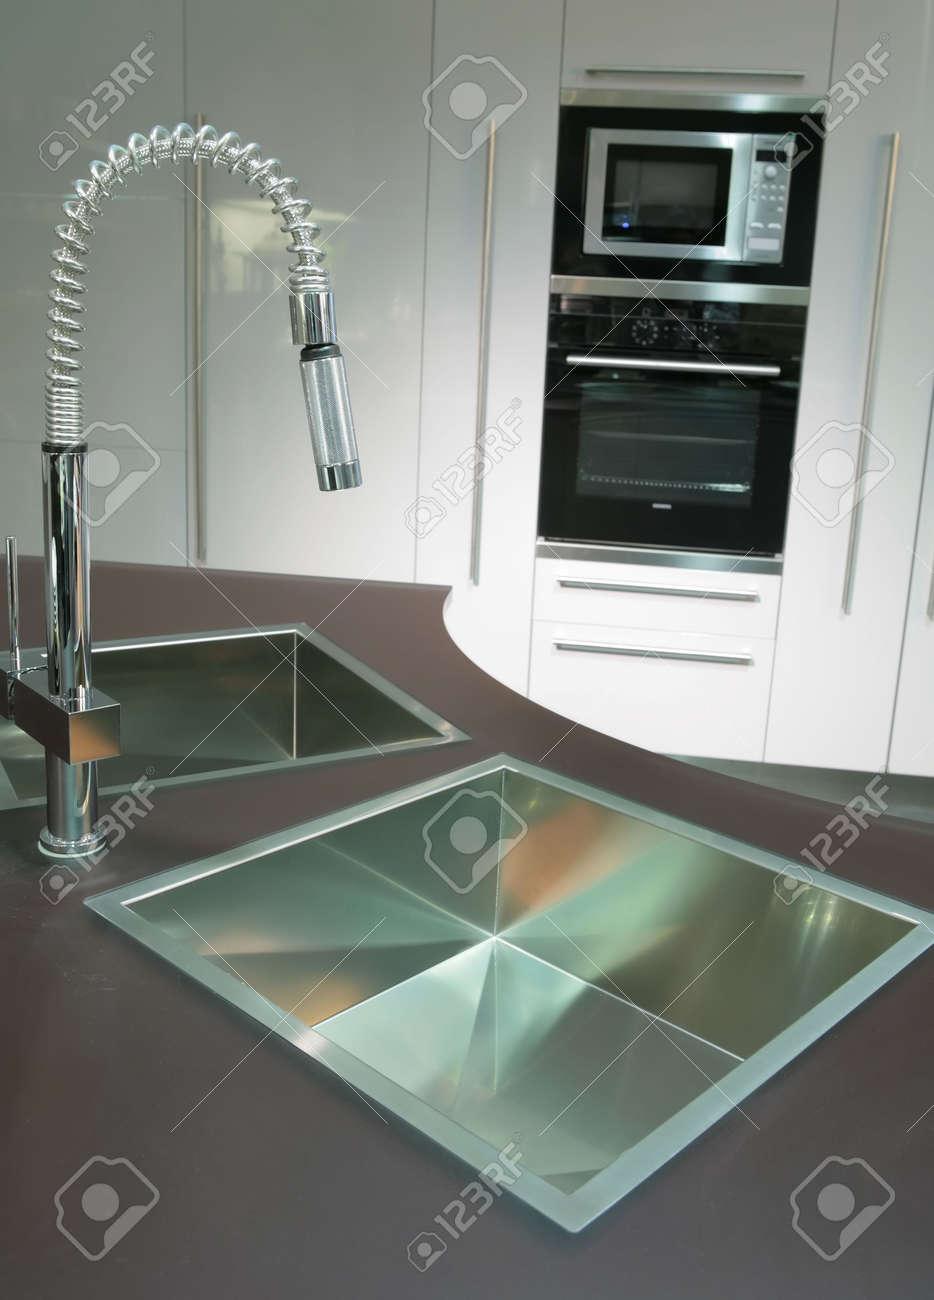 modern metallic sink with graceful tap on the super-modern kitchen Stock Photo - 3001822